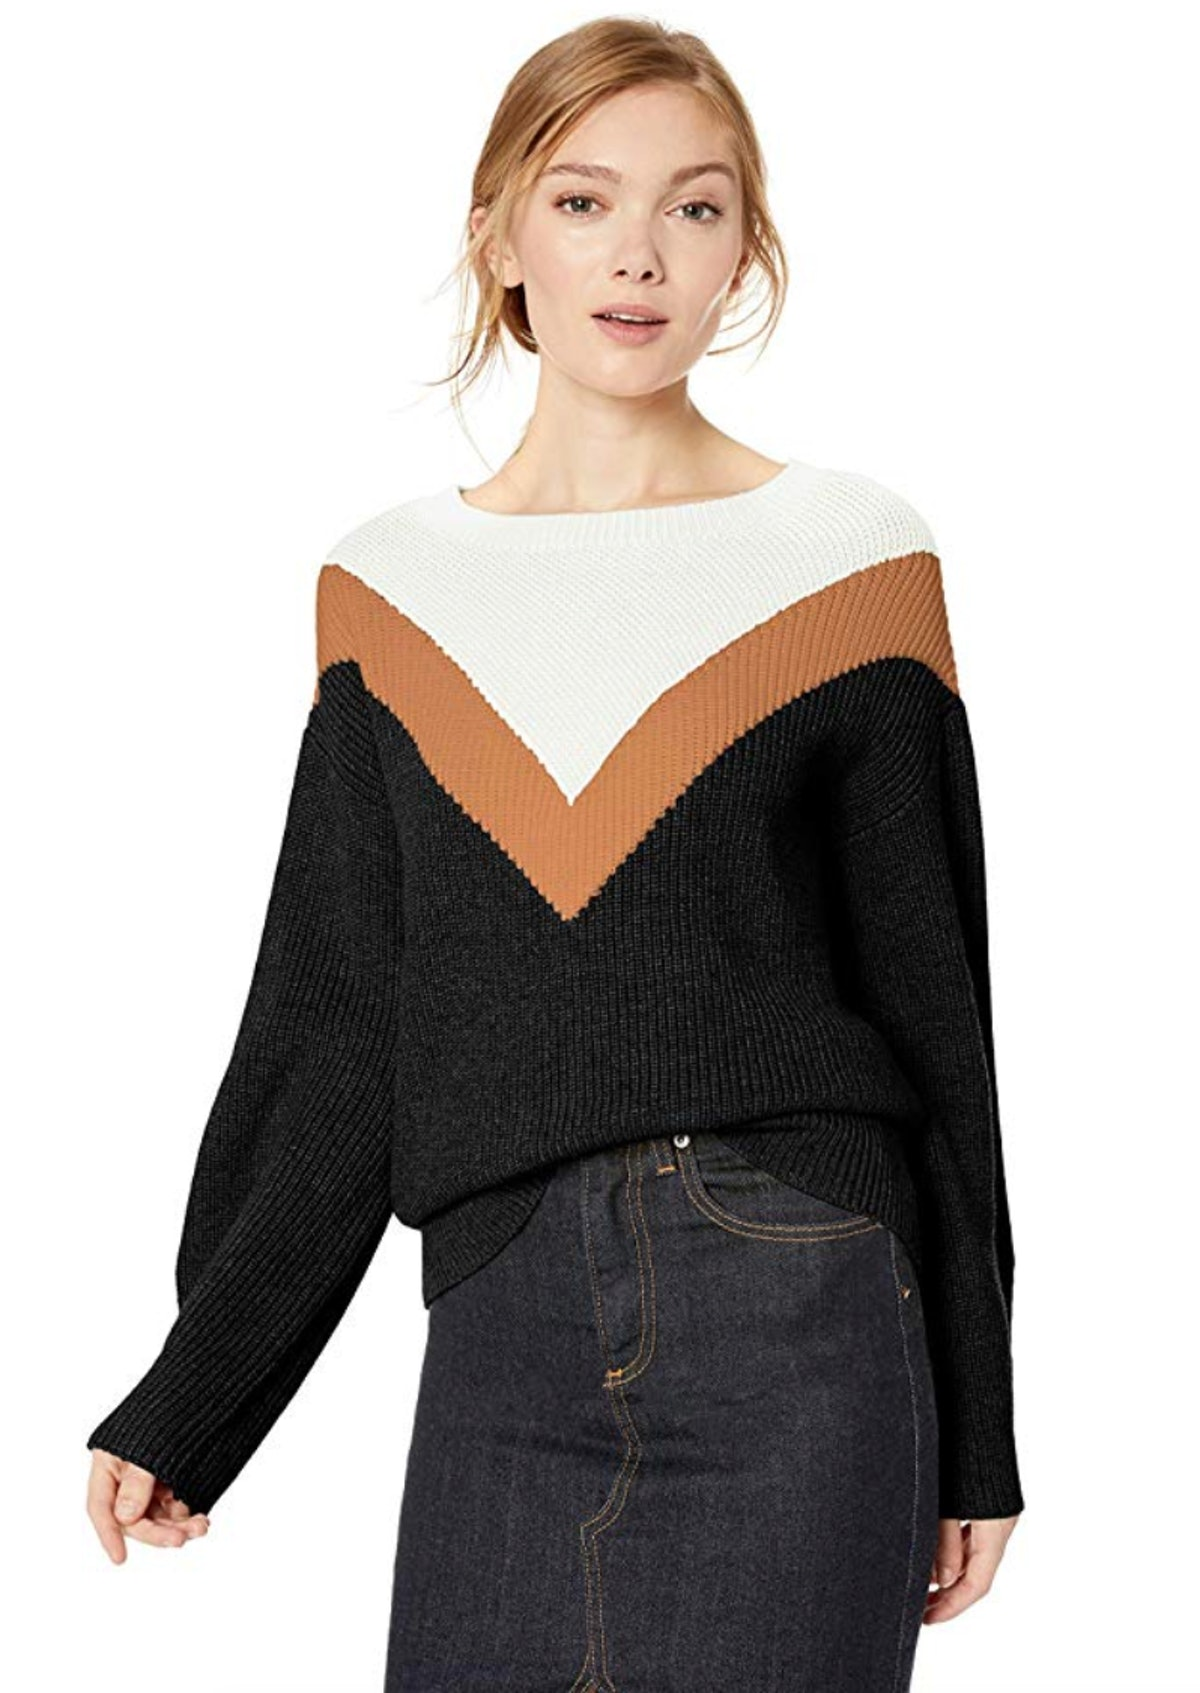 Cable Stitch Women's Geometric Colorblock Sweater